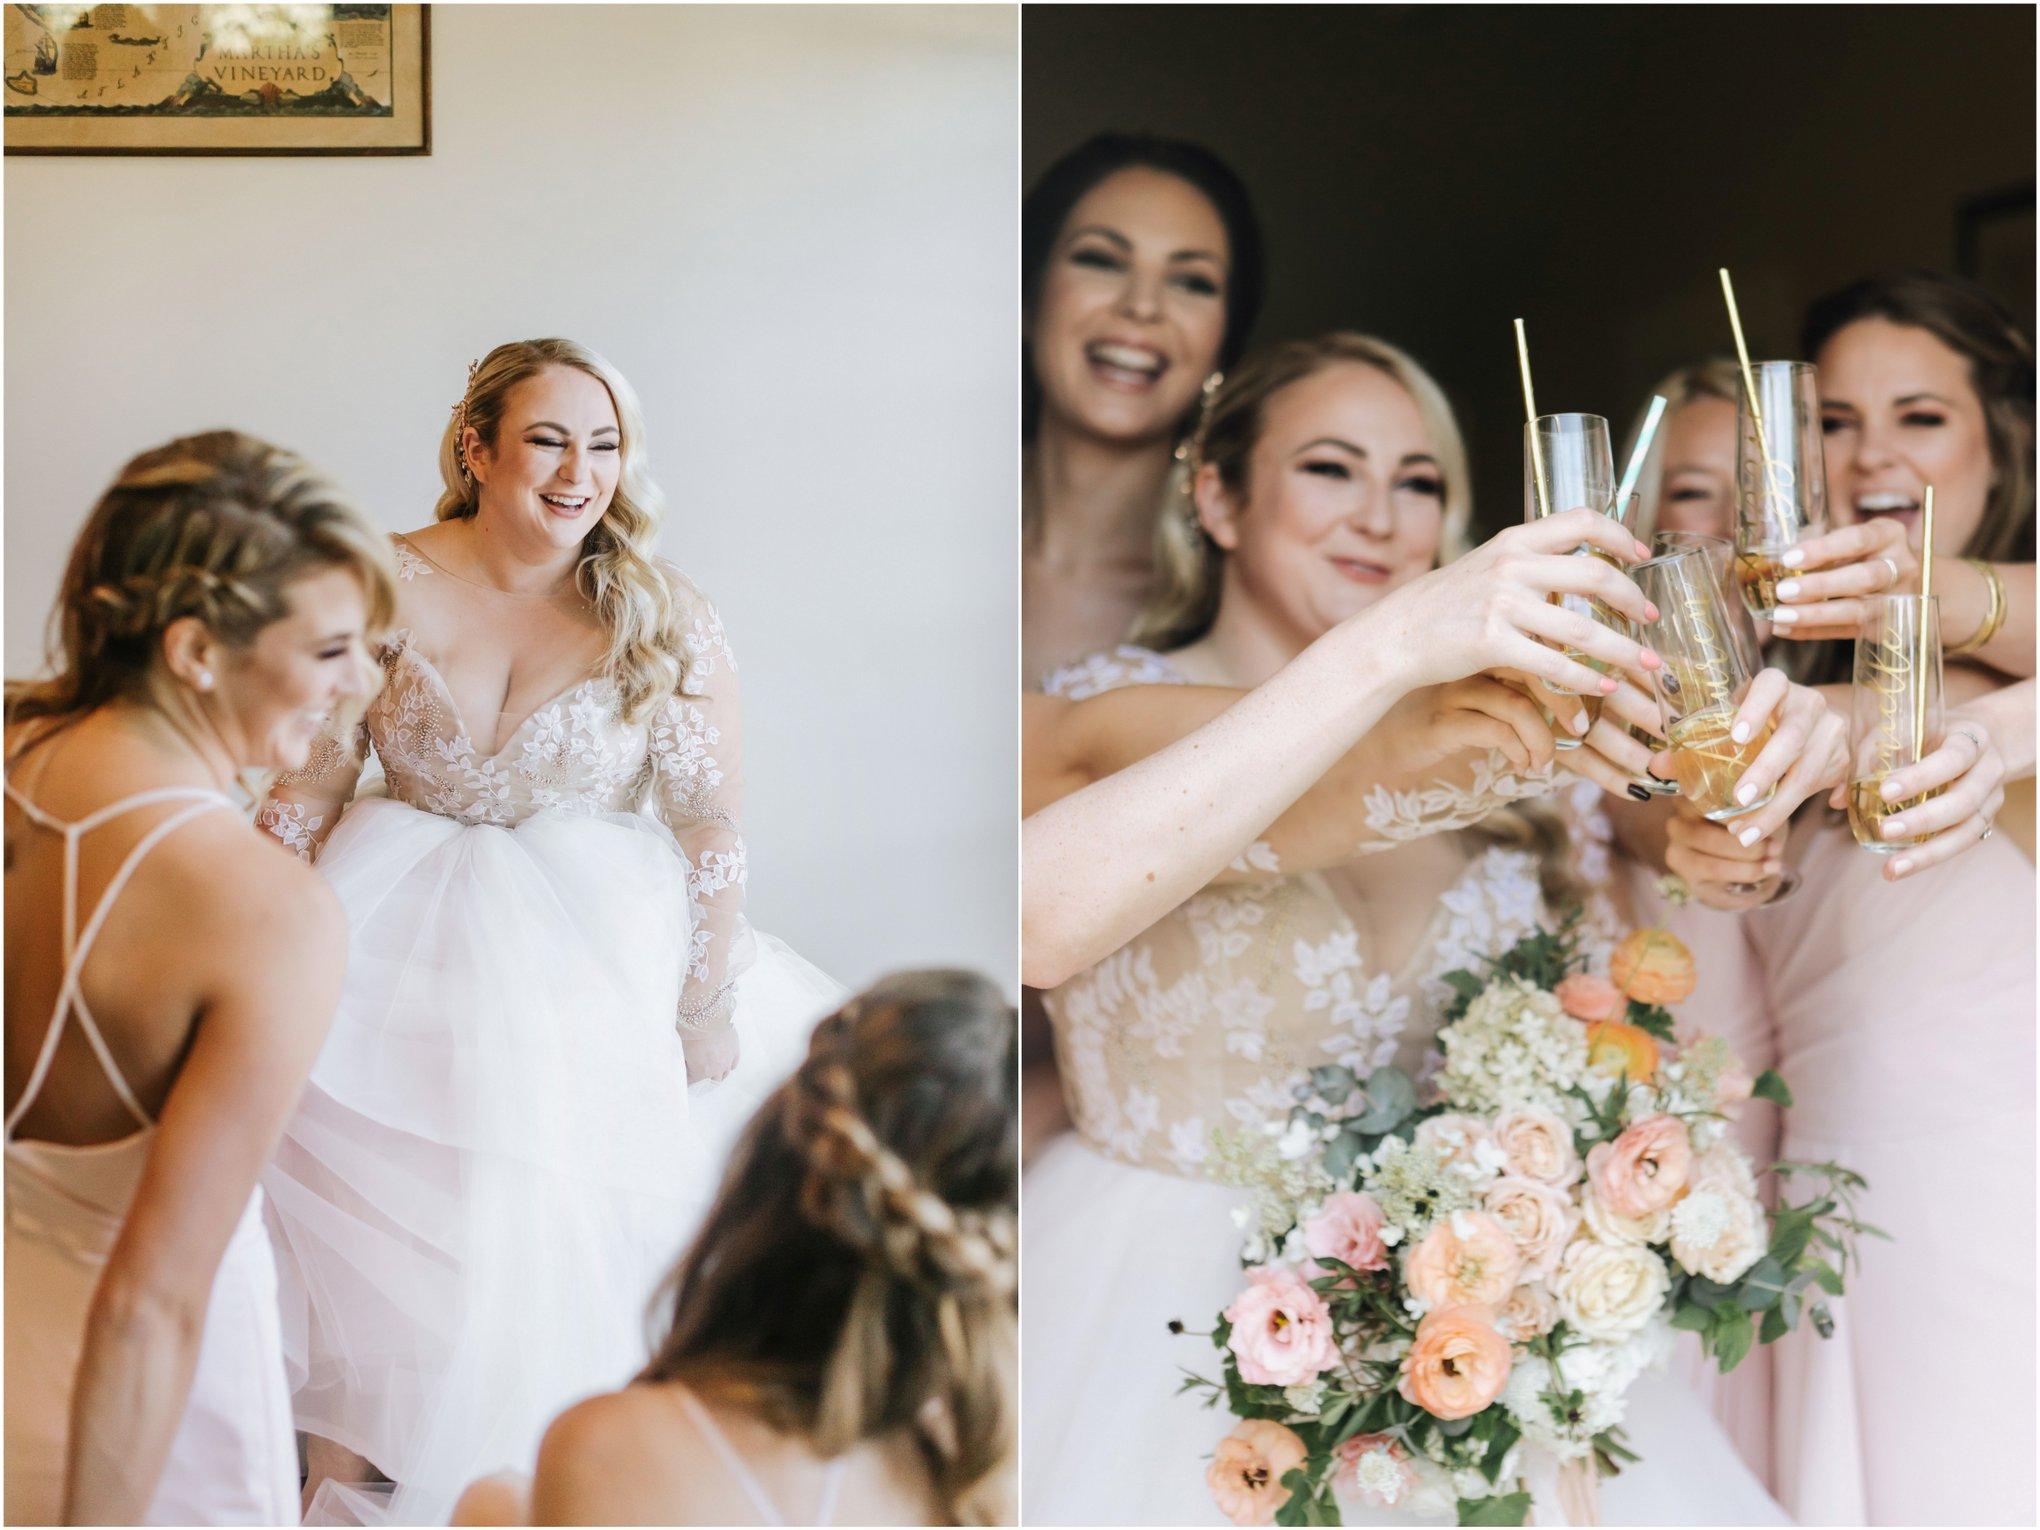 Marthas-Vineyard-Wedding-Photographer-Beach-Plum-Inn-7.jpg